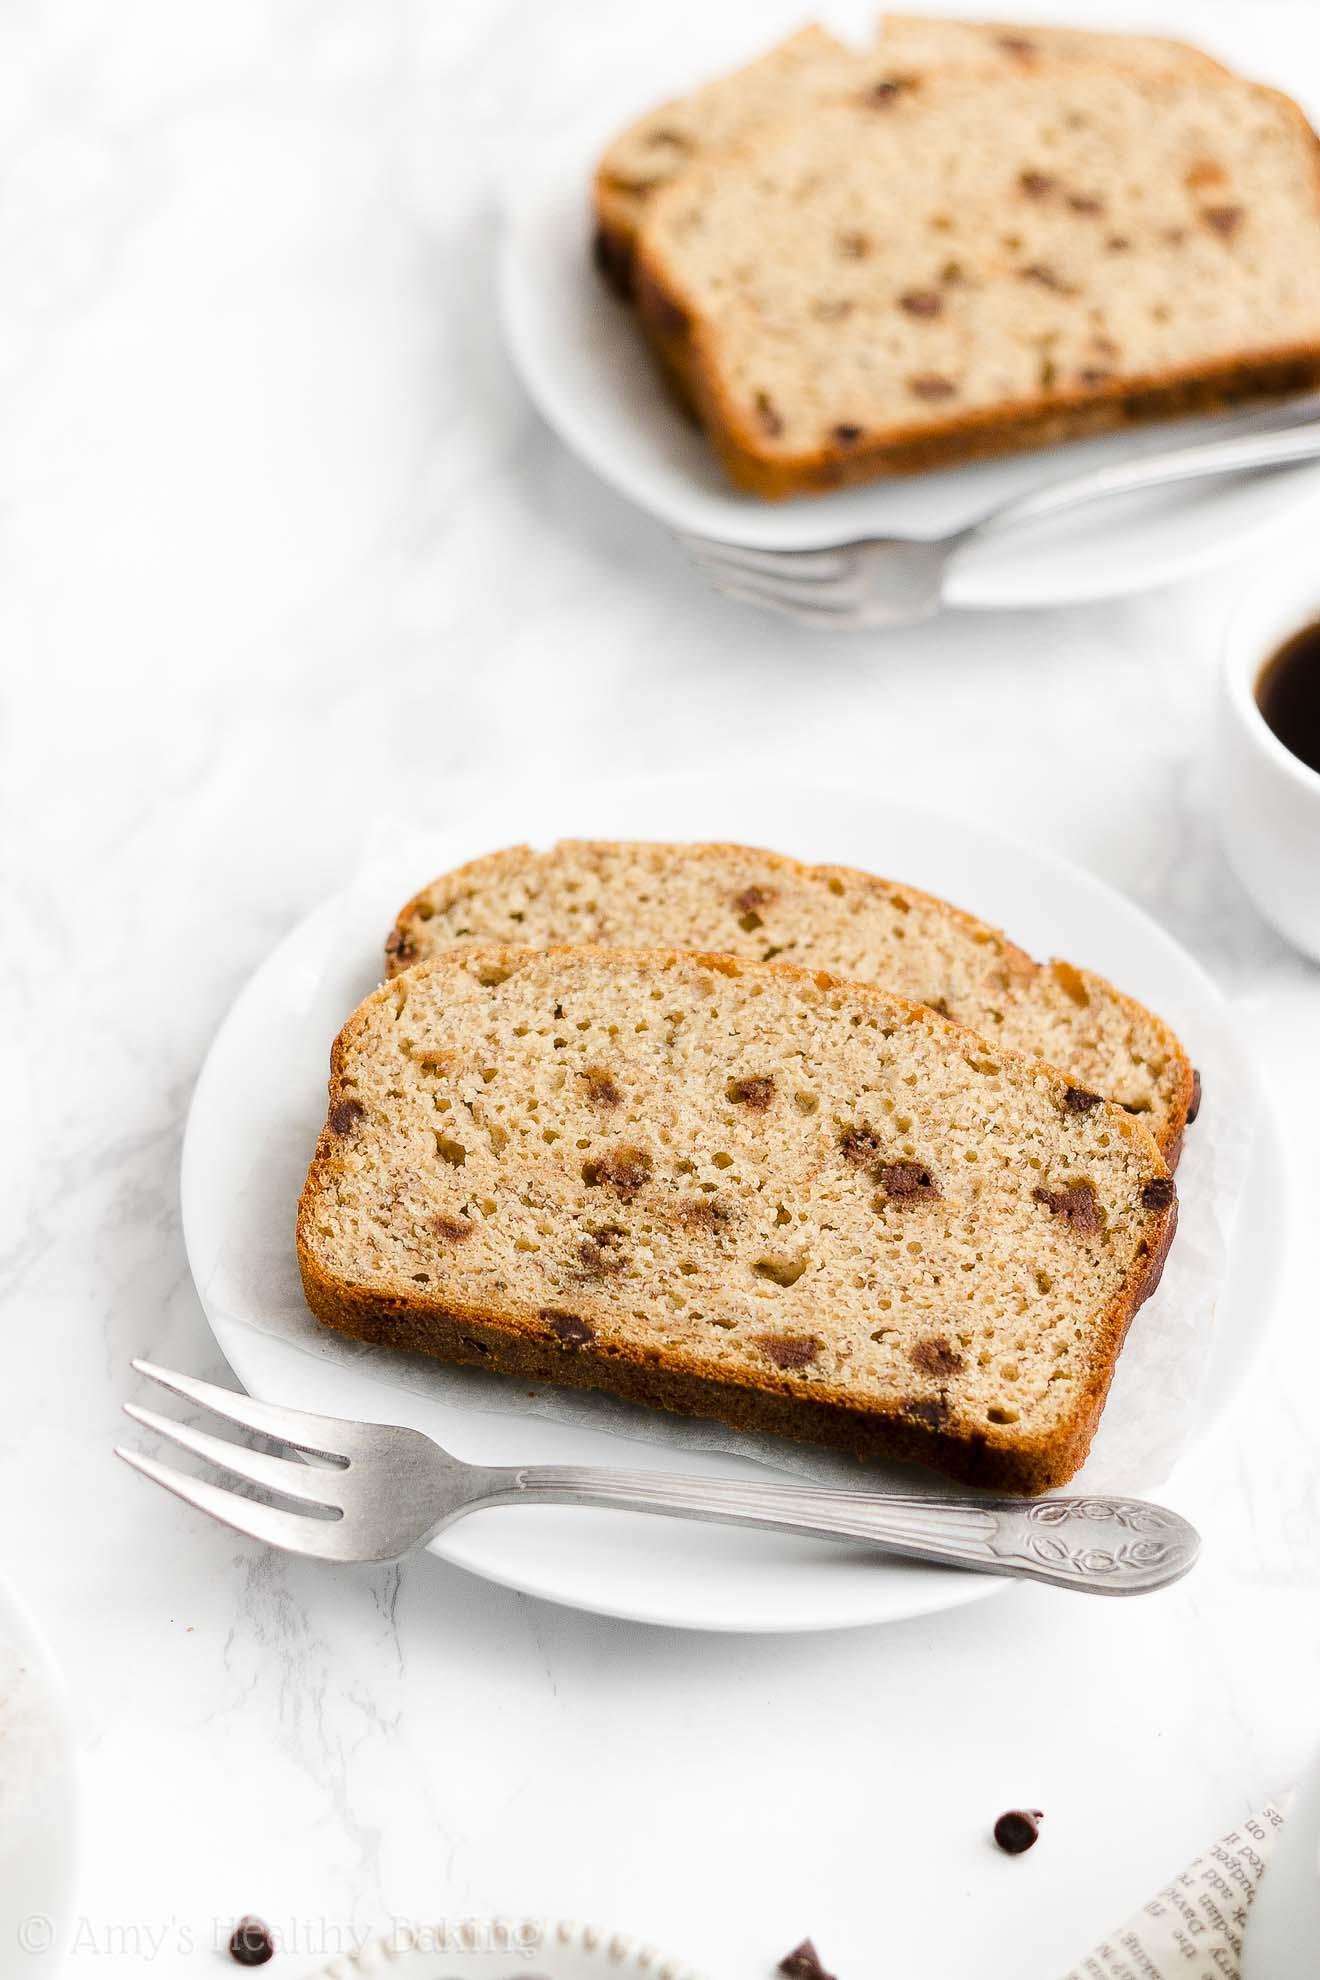 Best Easy Healthy Gluten Free Low Sugar Greek Yogurt Chocolate Chip Banana Bread